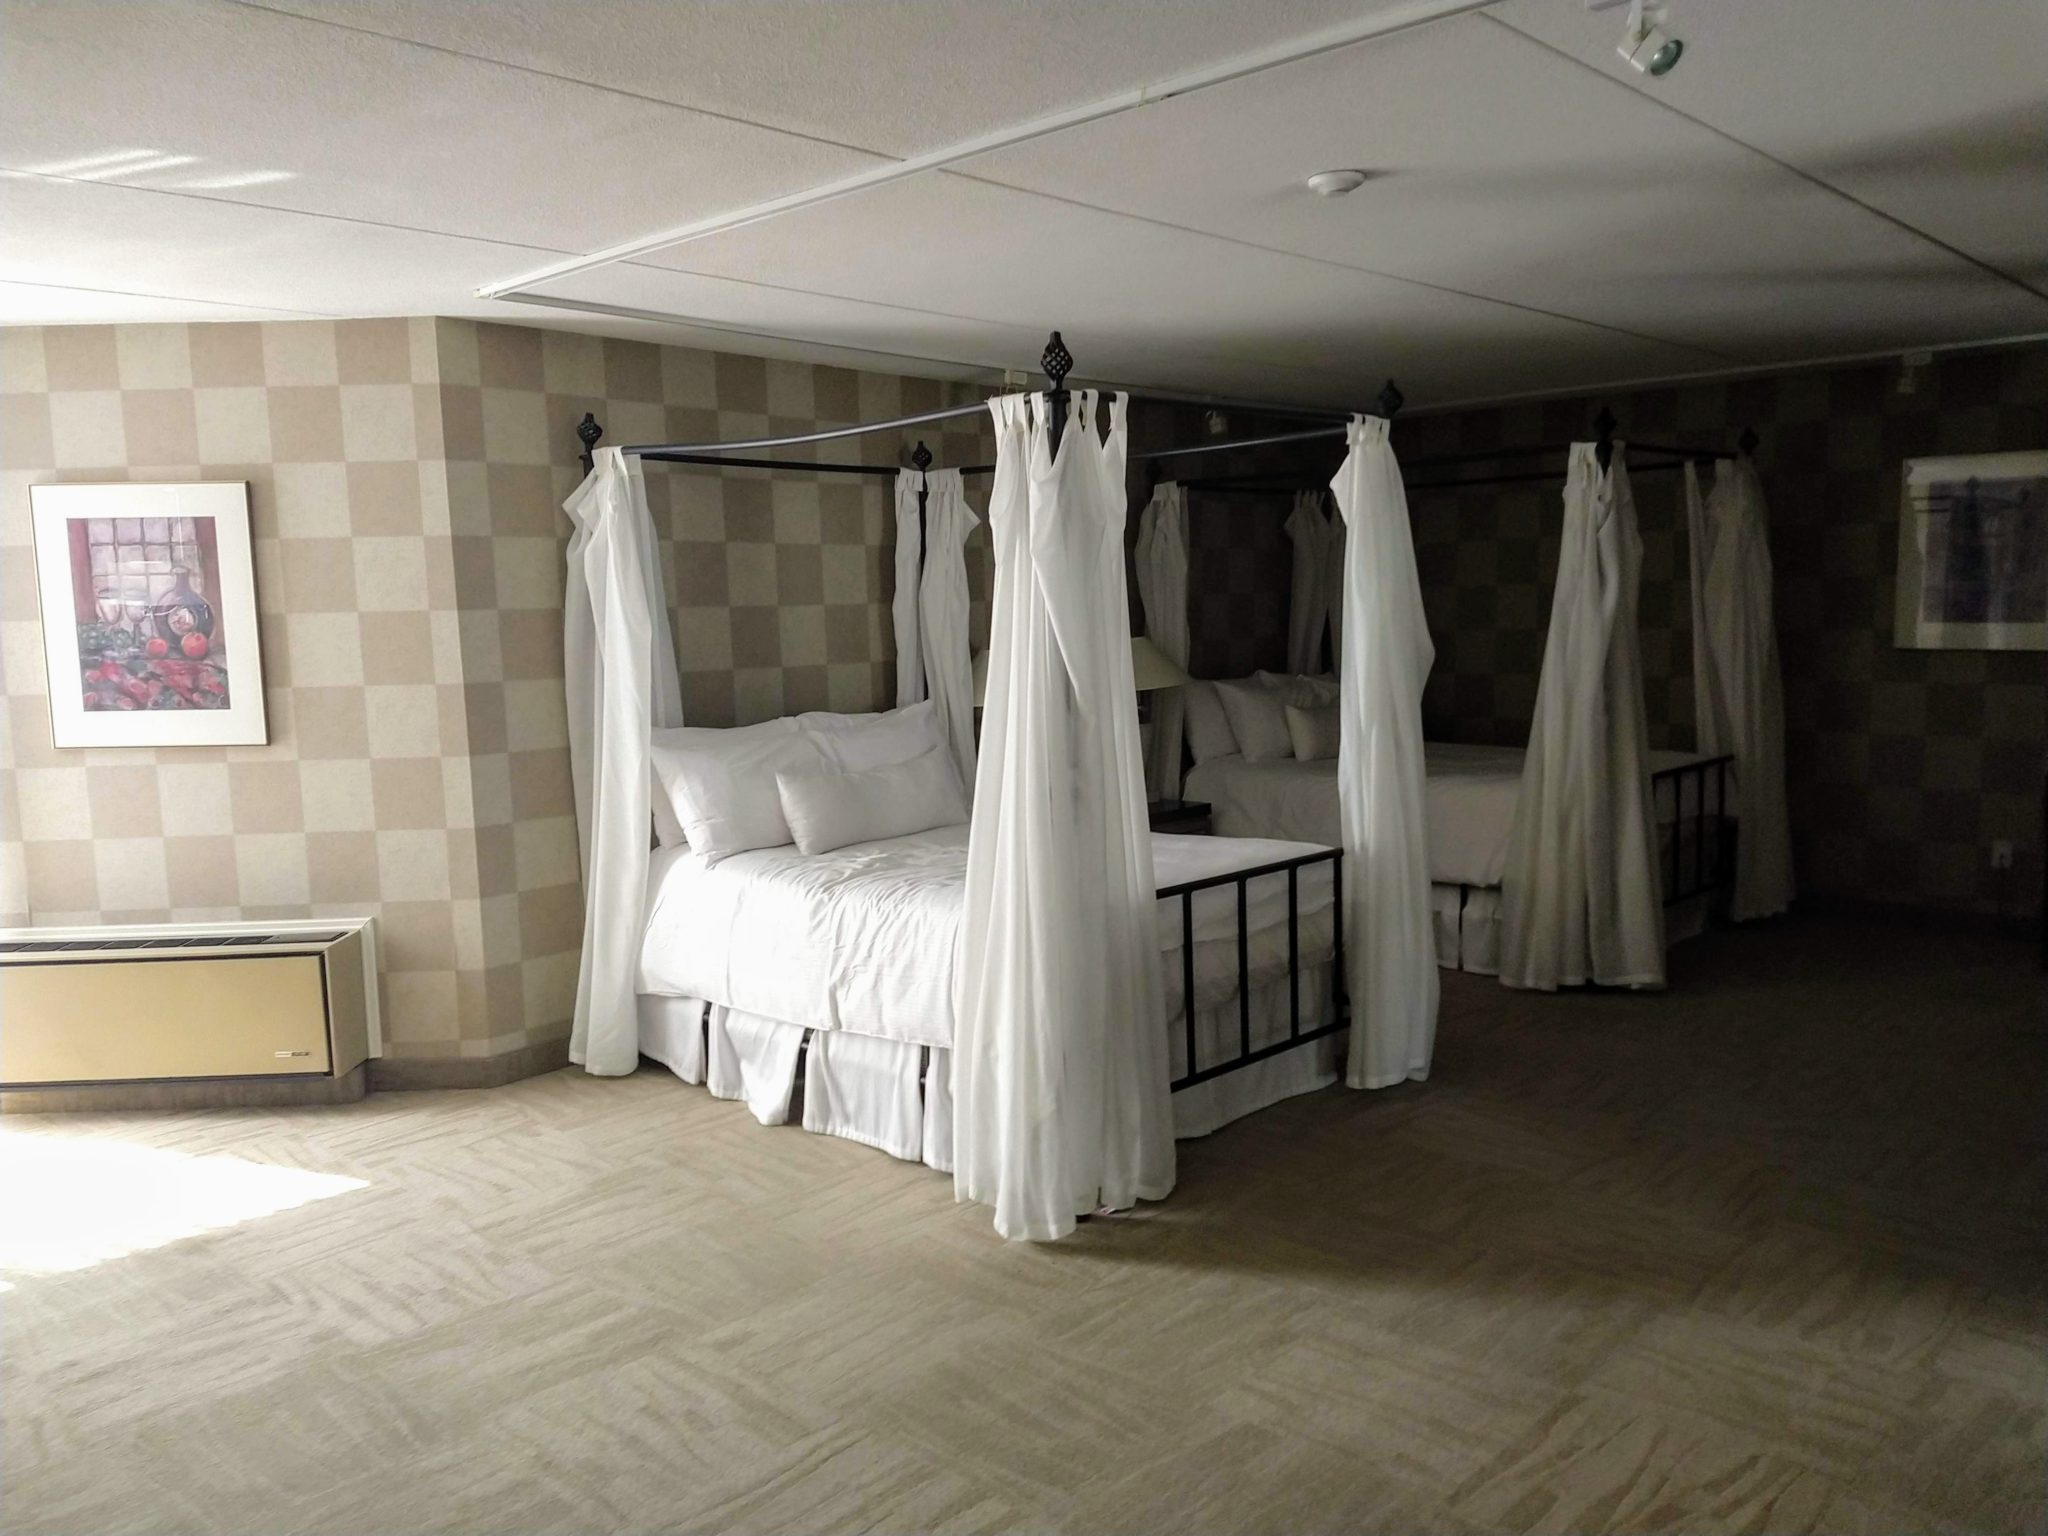 Poster Bed White Oaks Spa & Resort Niagara-on-the-Lake Ontario Canada